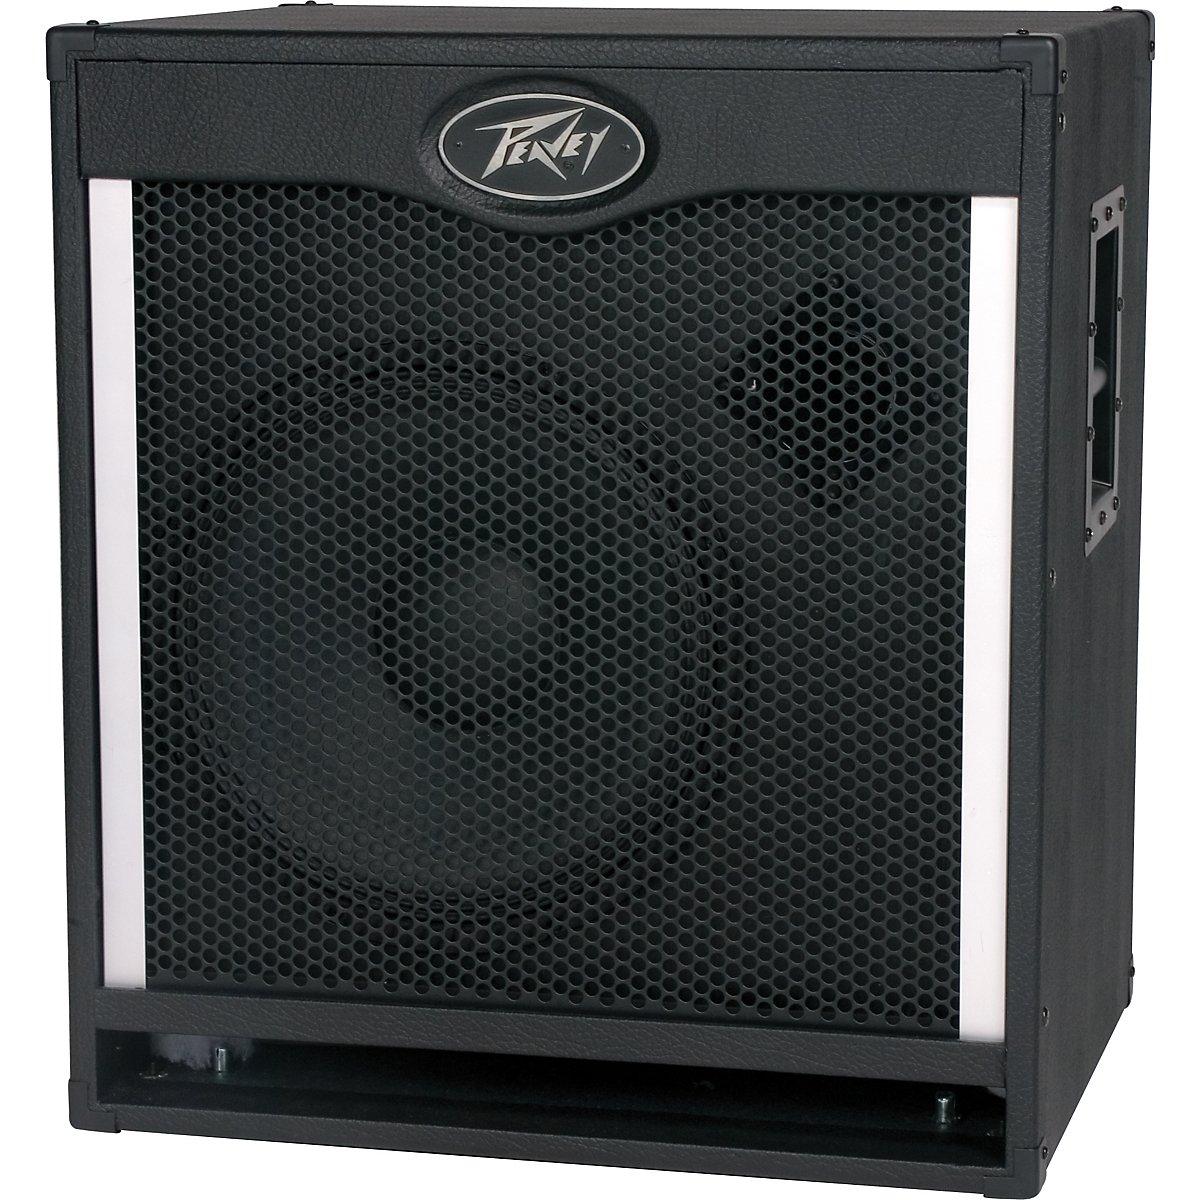 Amazon.com: Peavey VB-115 Bass Speaker Cabinet: Home Audio & Theater